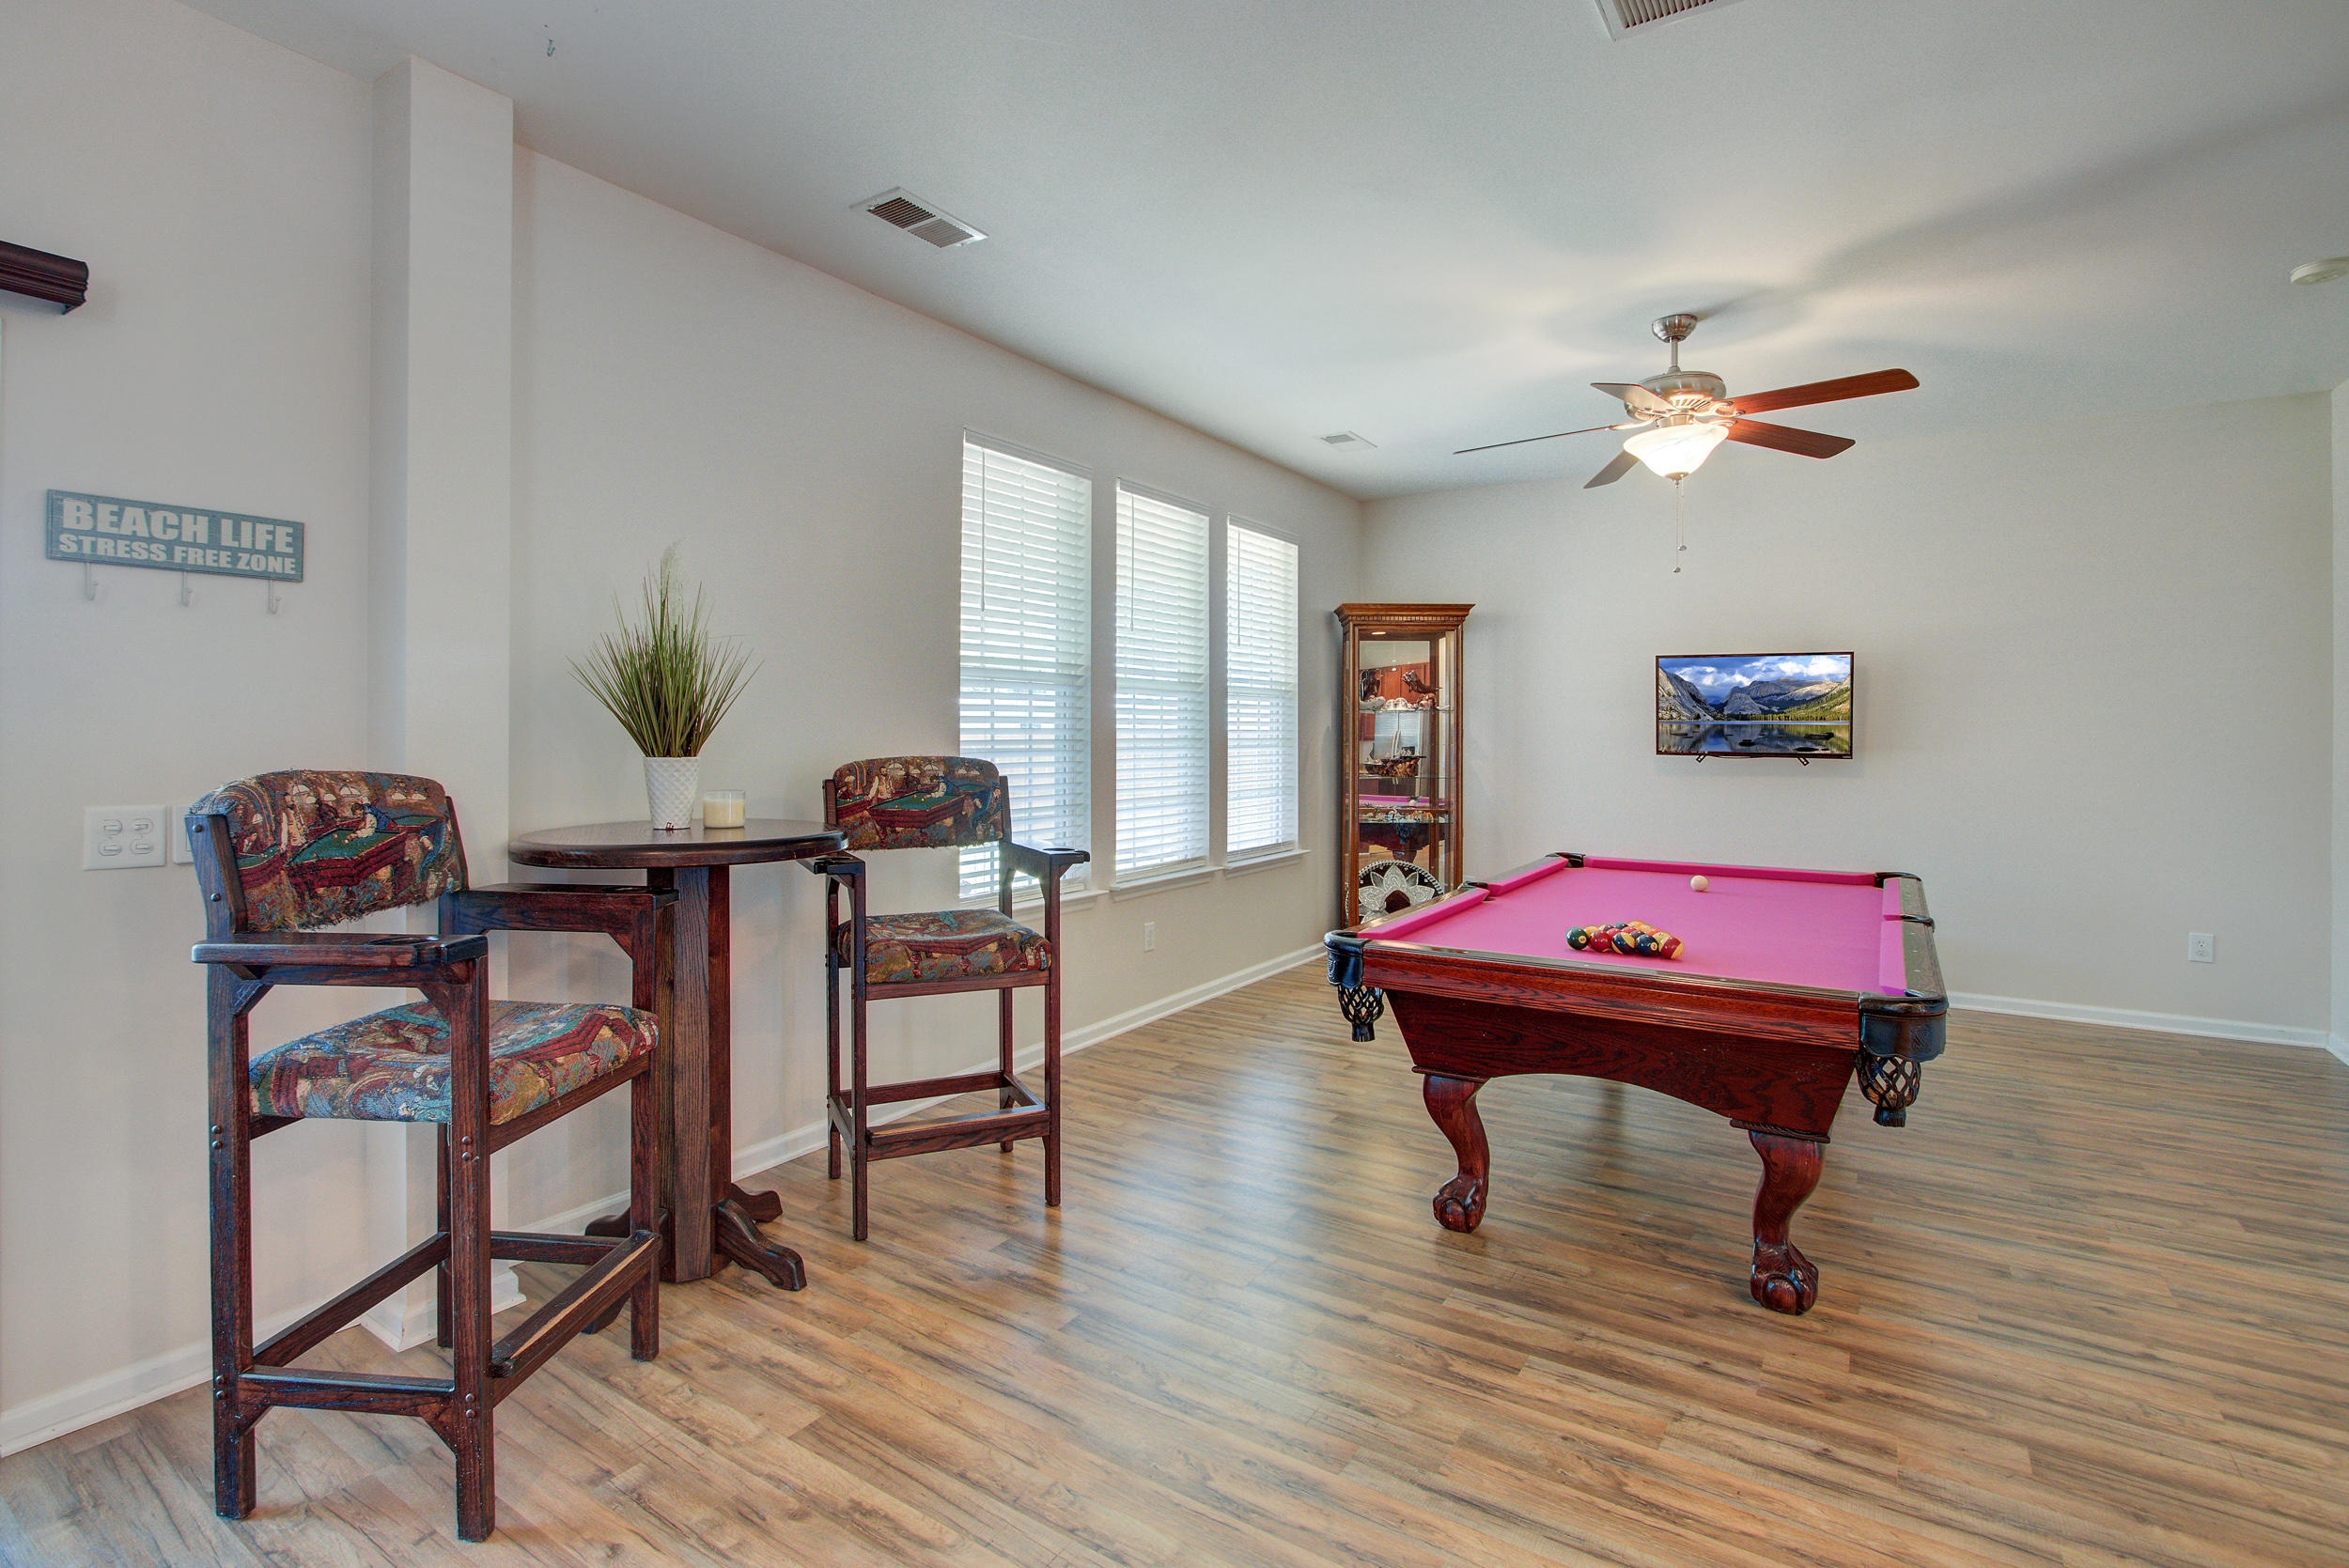 Oakley Pointe Homes For Sale - 576 English Oak, Moncks Corner, SC - 56